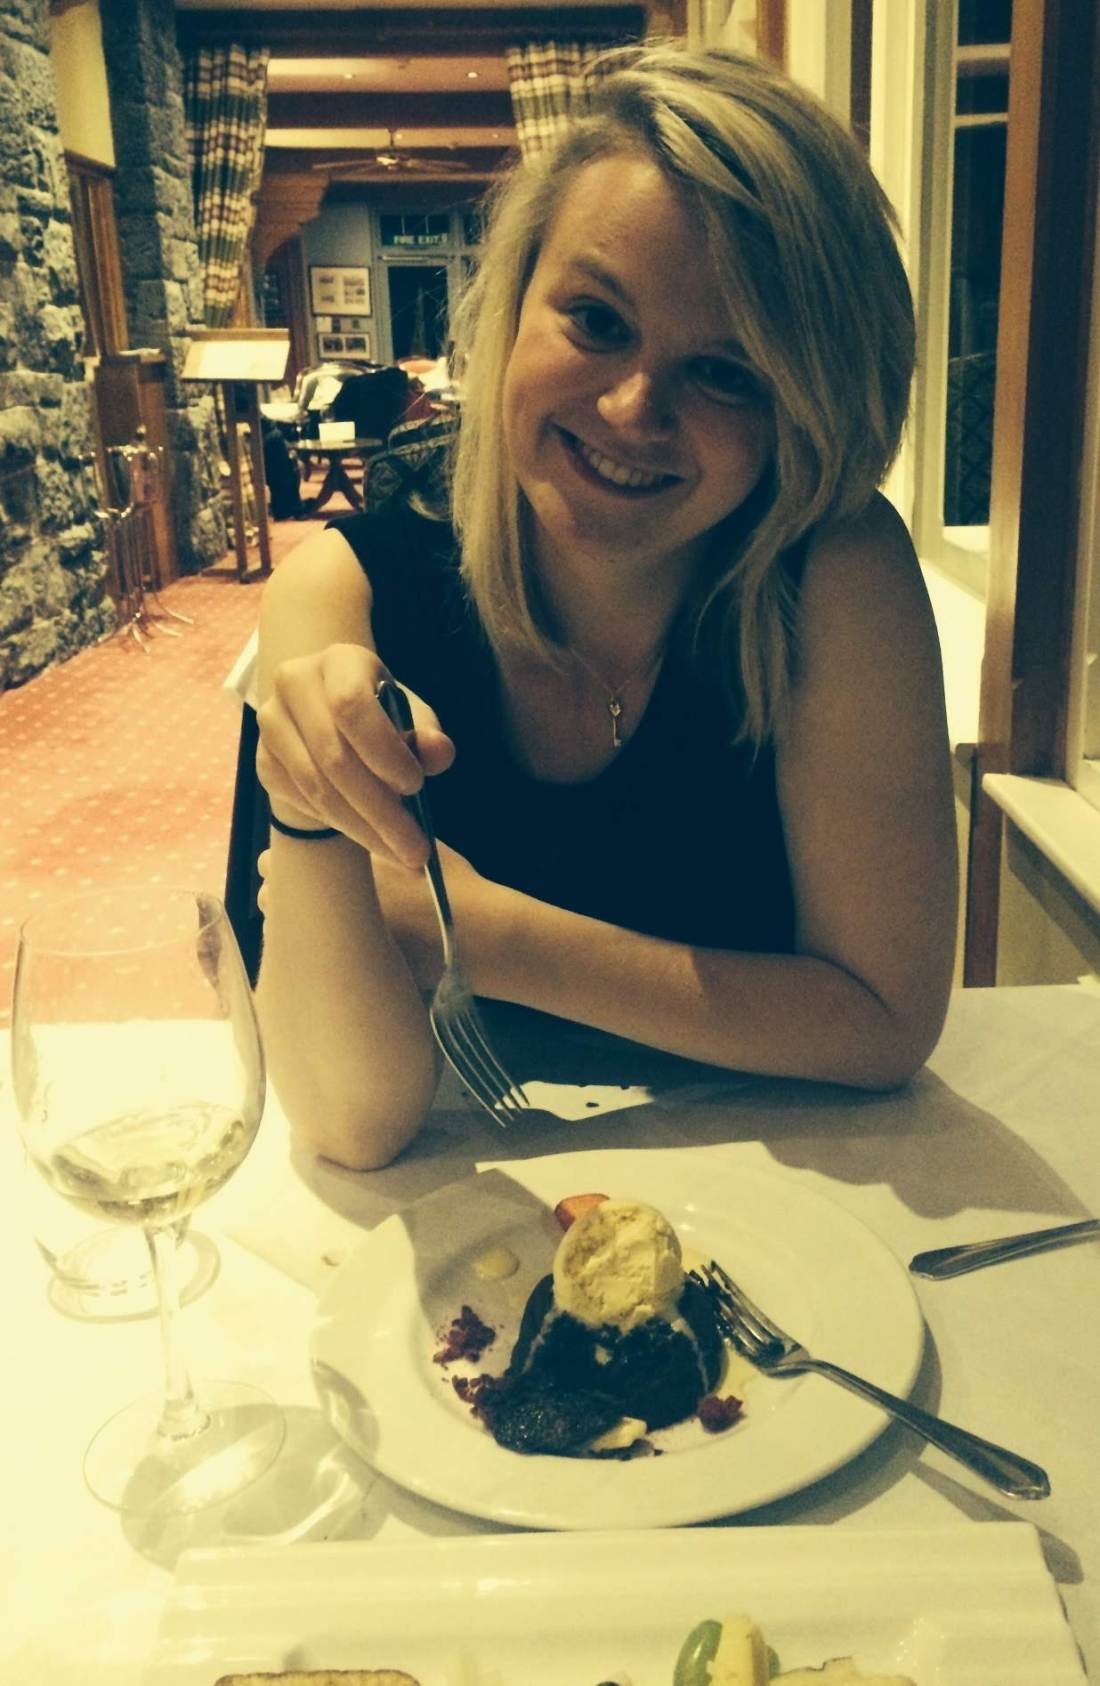 Laura eating dessert at Lake Vyrnwy